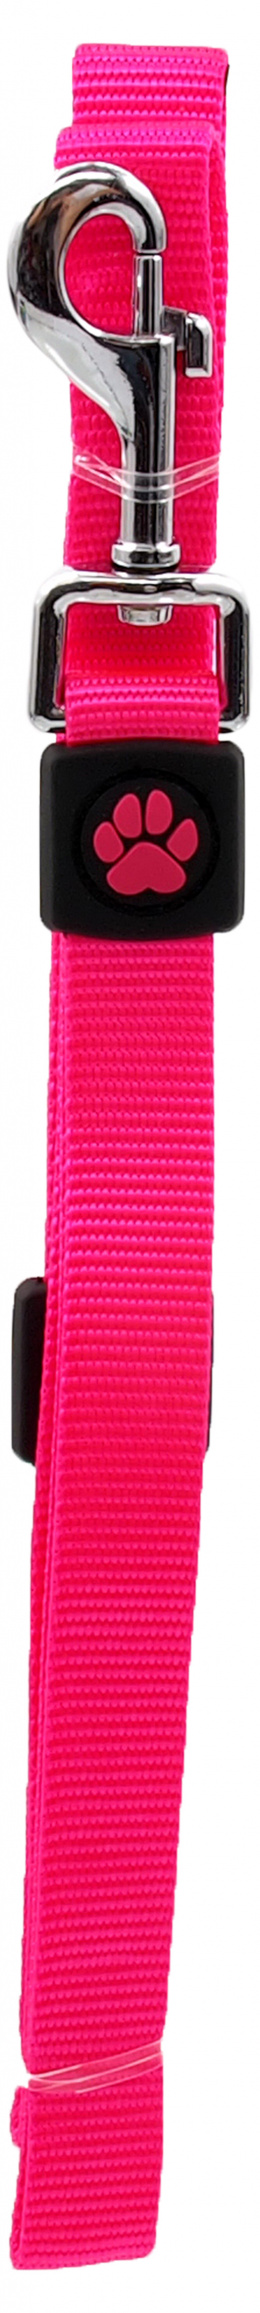 Vodítko Active Dog Premium M růžové 2x120cm